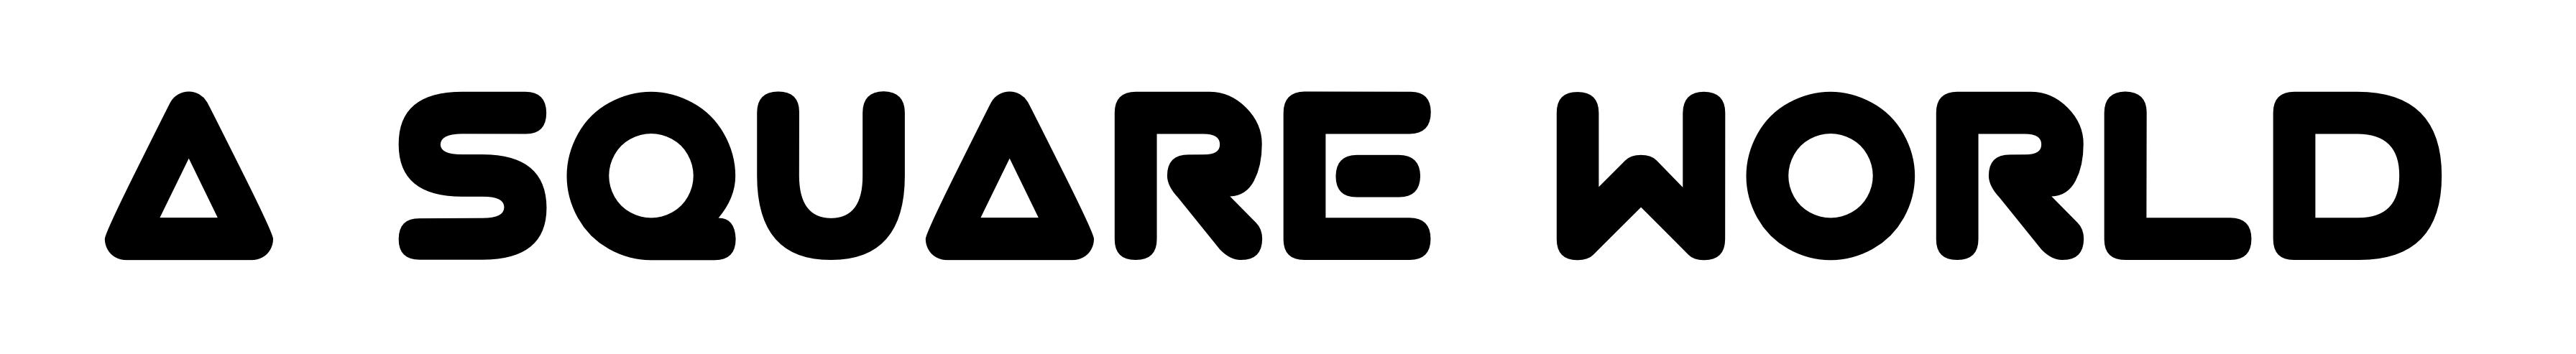 general-logo-black-copy